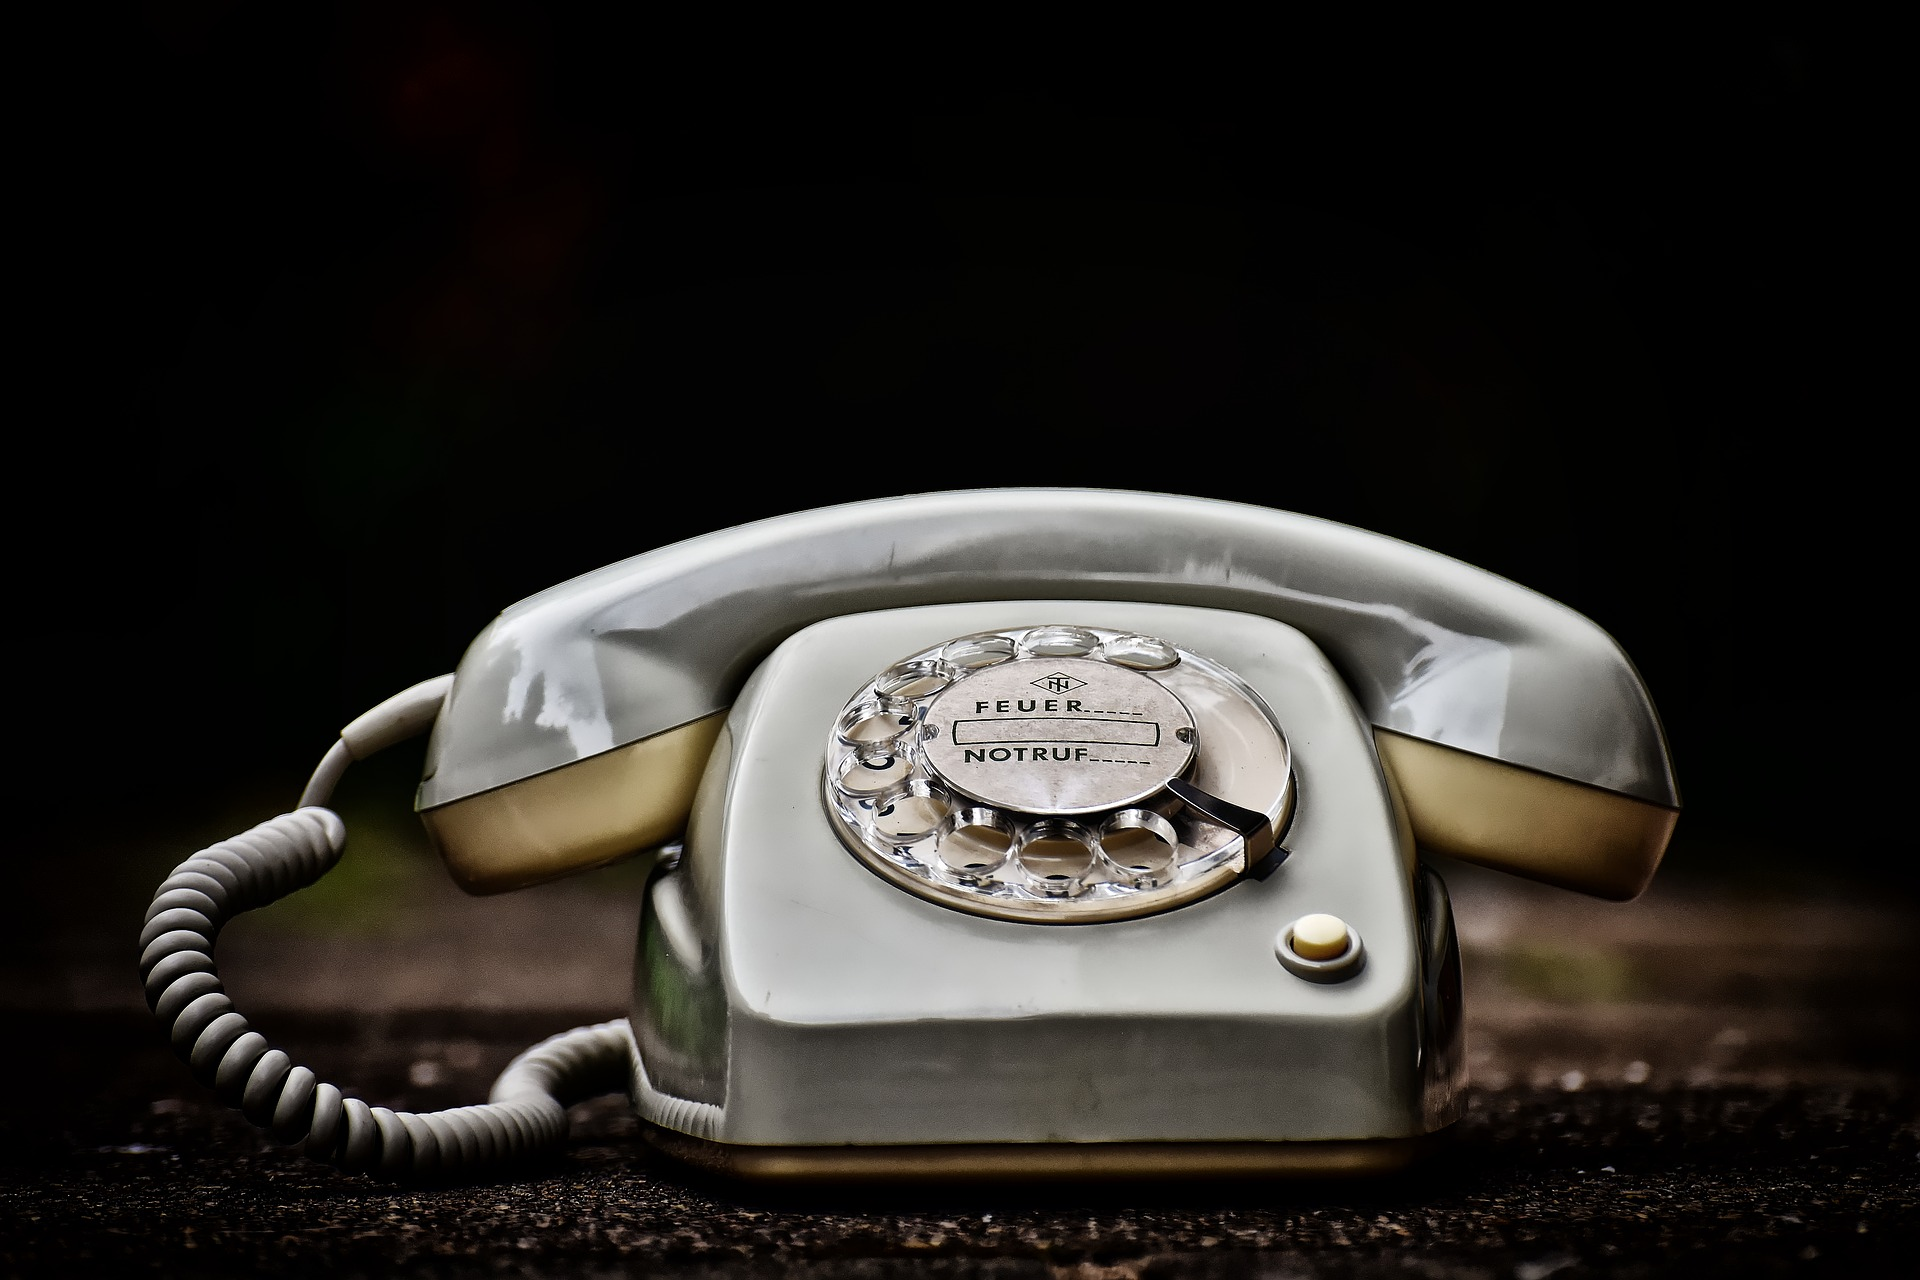 bredband genom telefonjacket